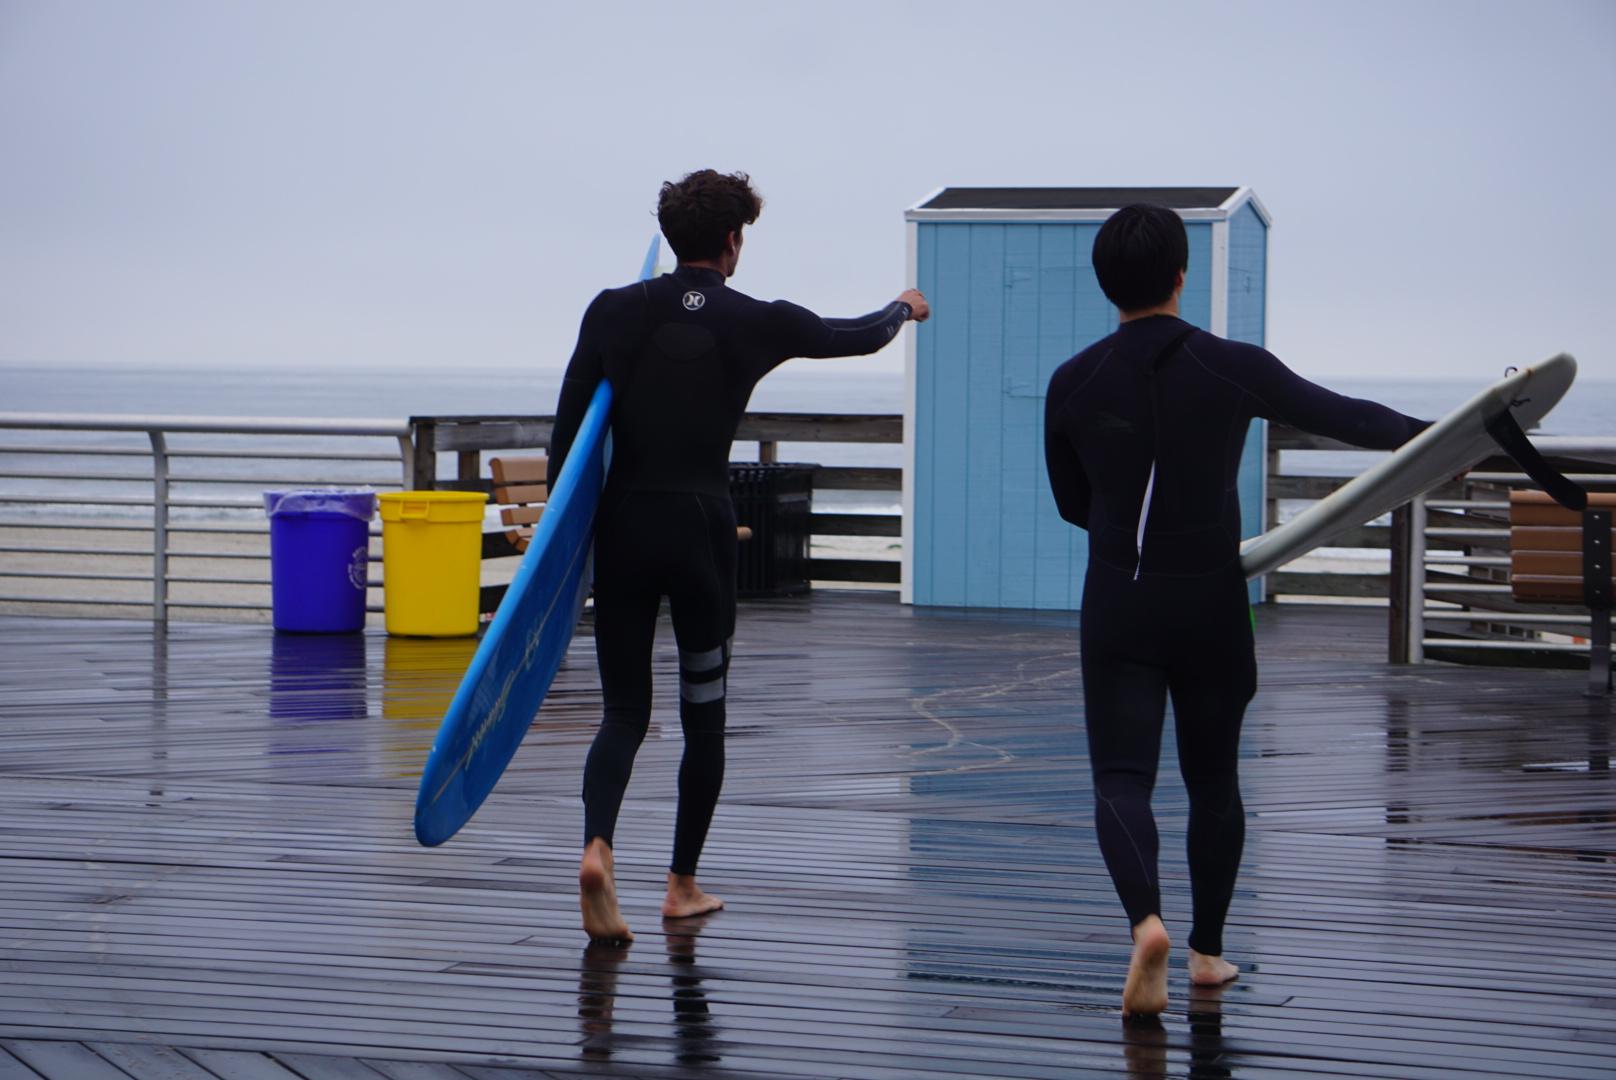 surfing lessons nyc Conatus Surf Club